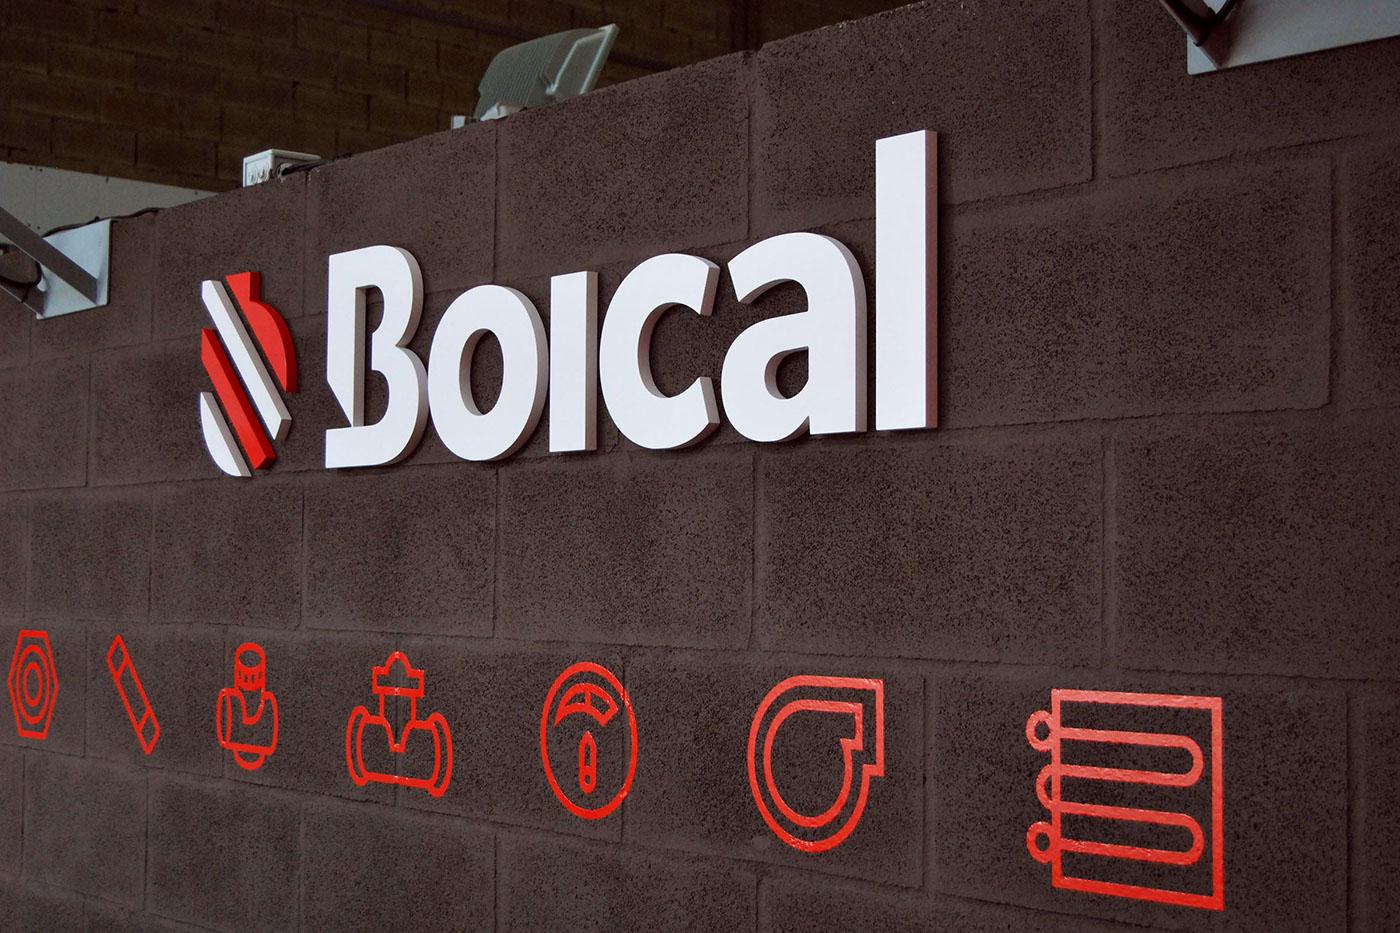 Signage brand boical Catalogue Boiler spare parts design logo